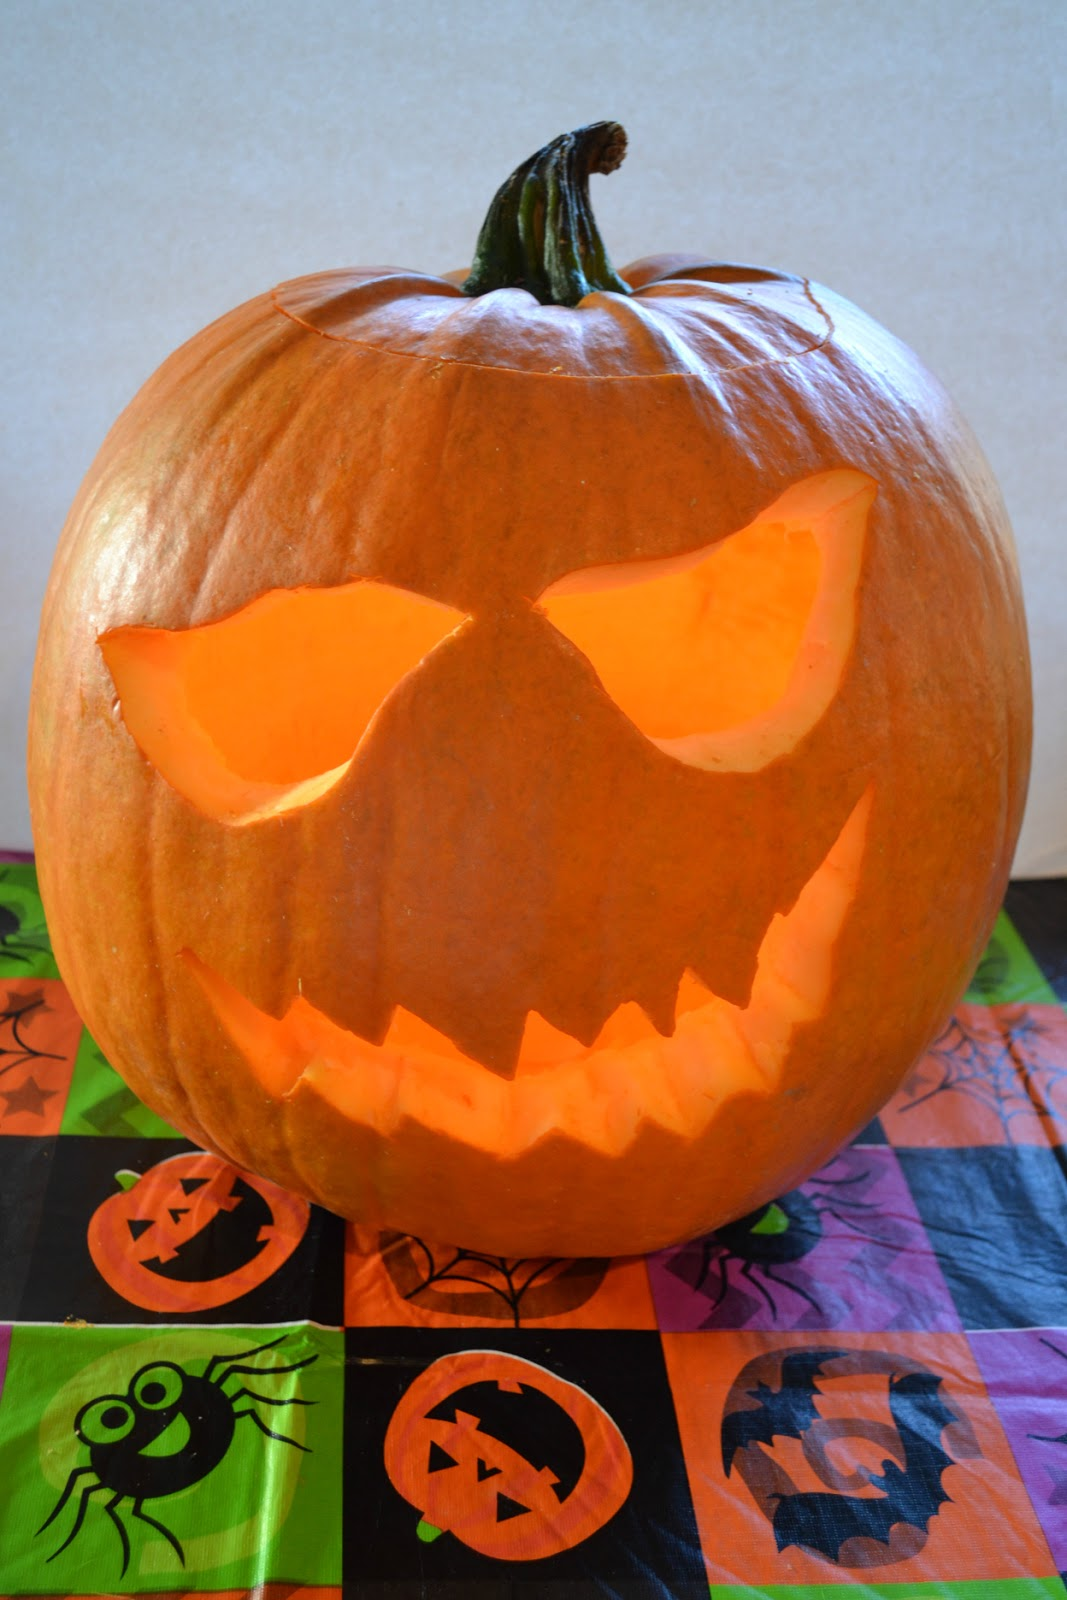 East coast mommy pumpkin carving ideas